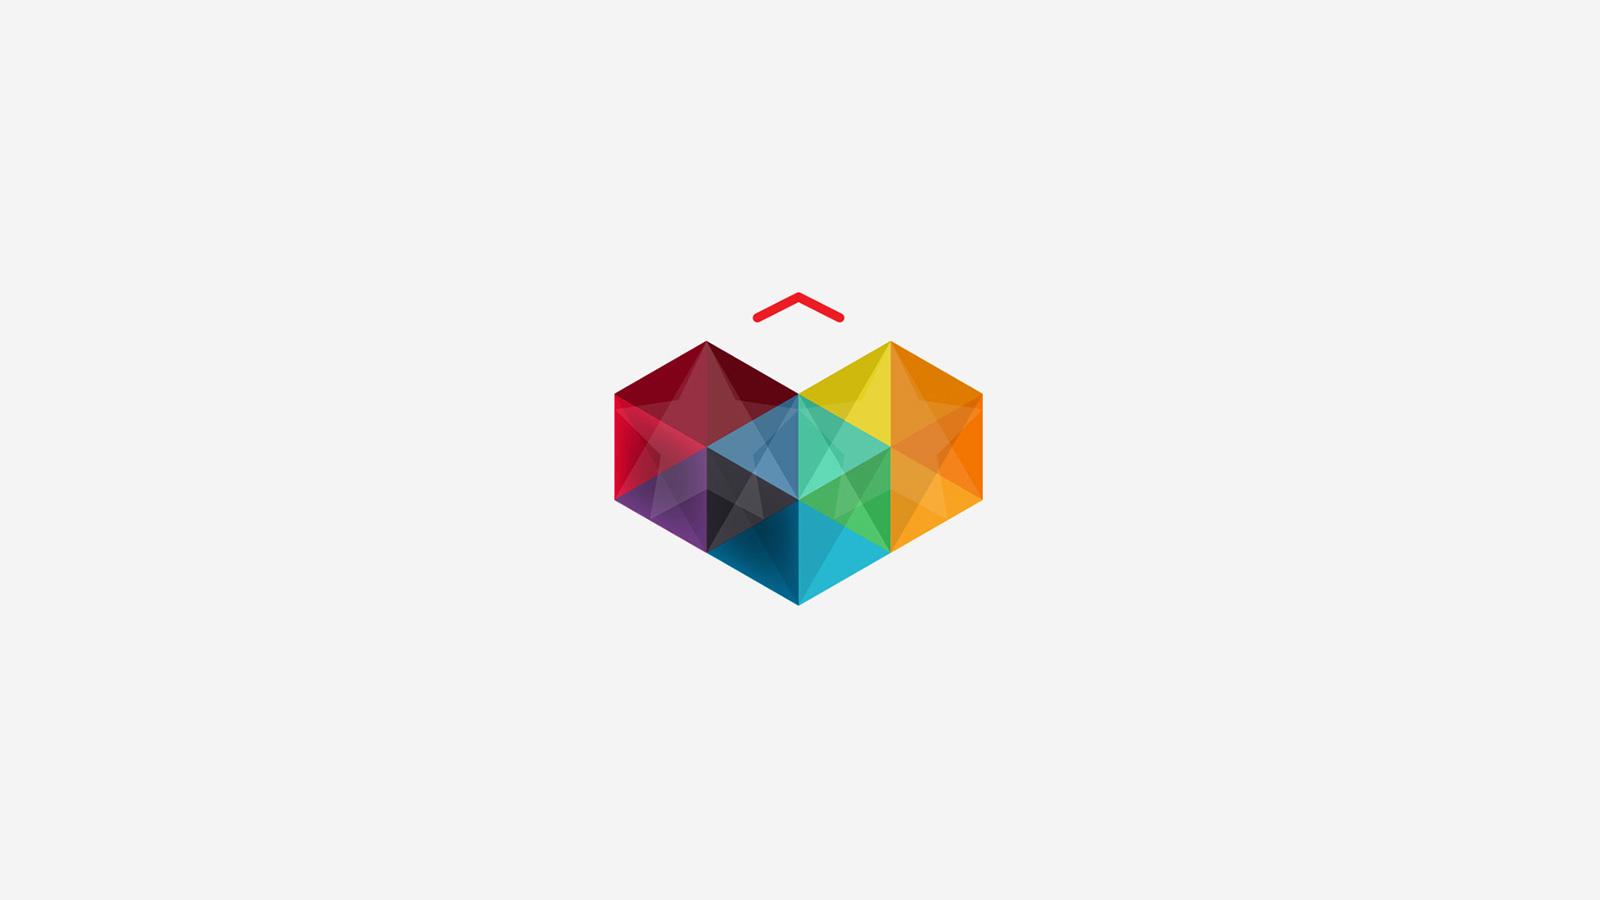 Logo design startup educational עיצוב לוגו סטארטאפ